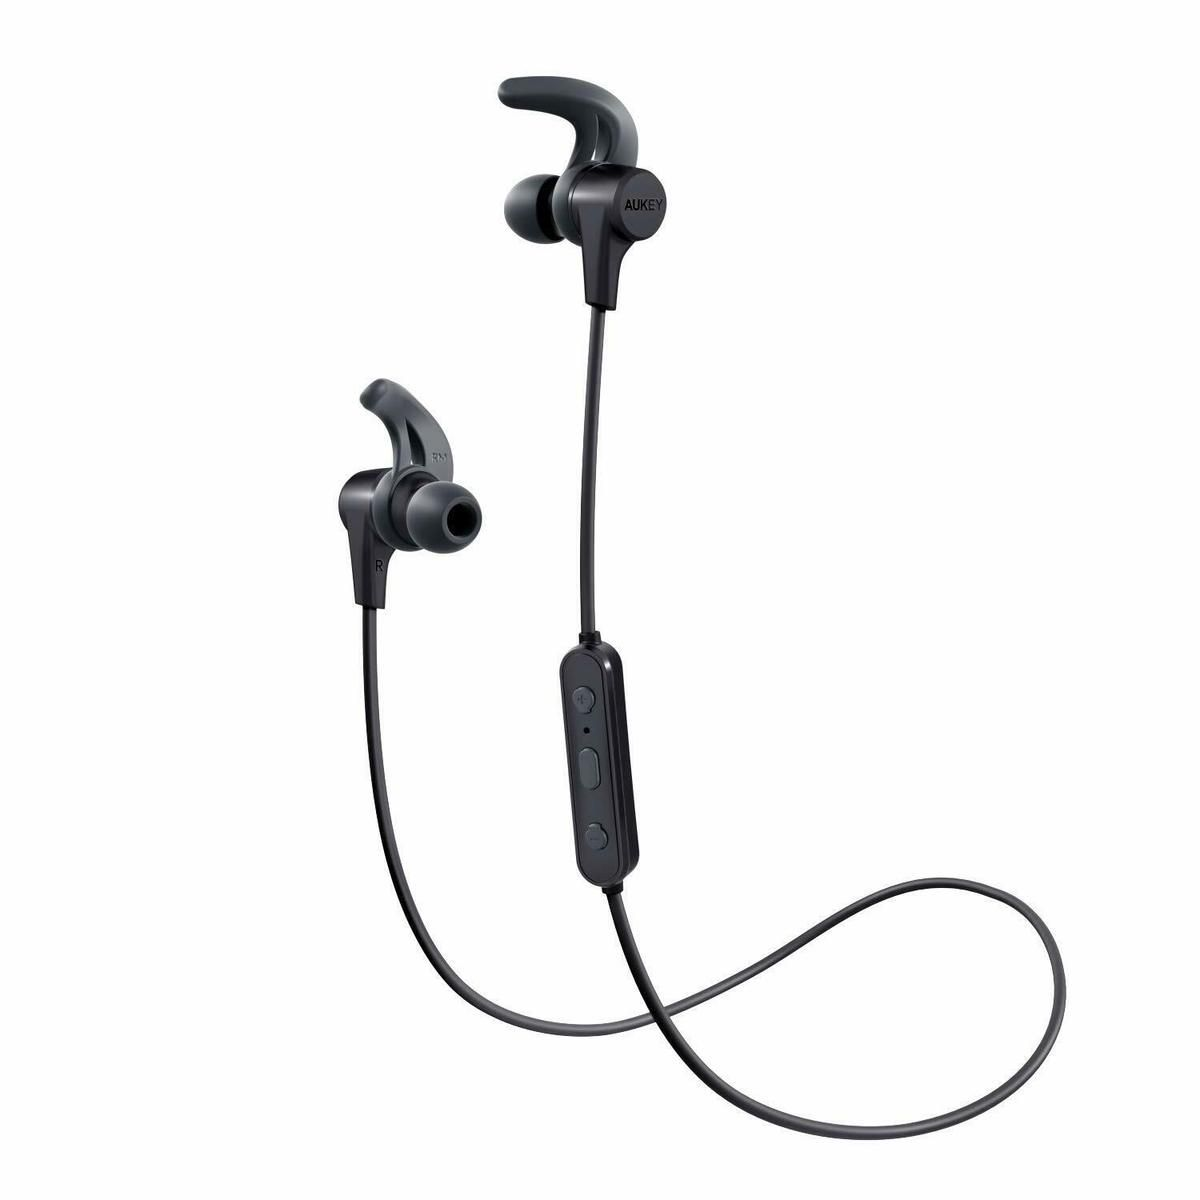 Aukey Bluetooth 4 1 In Ear Kopfhorer Headset Ipx4 Iphone Android Huawei Schwarz In 2020 In Ear Kopfhorer Bluetooth Iphone